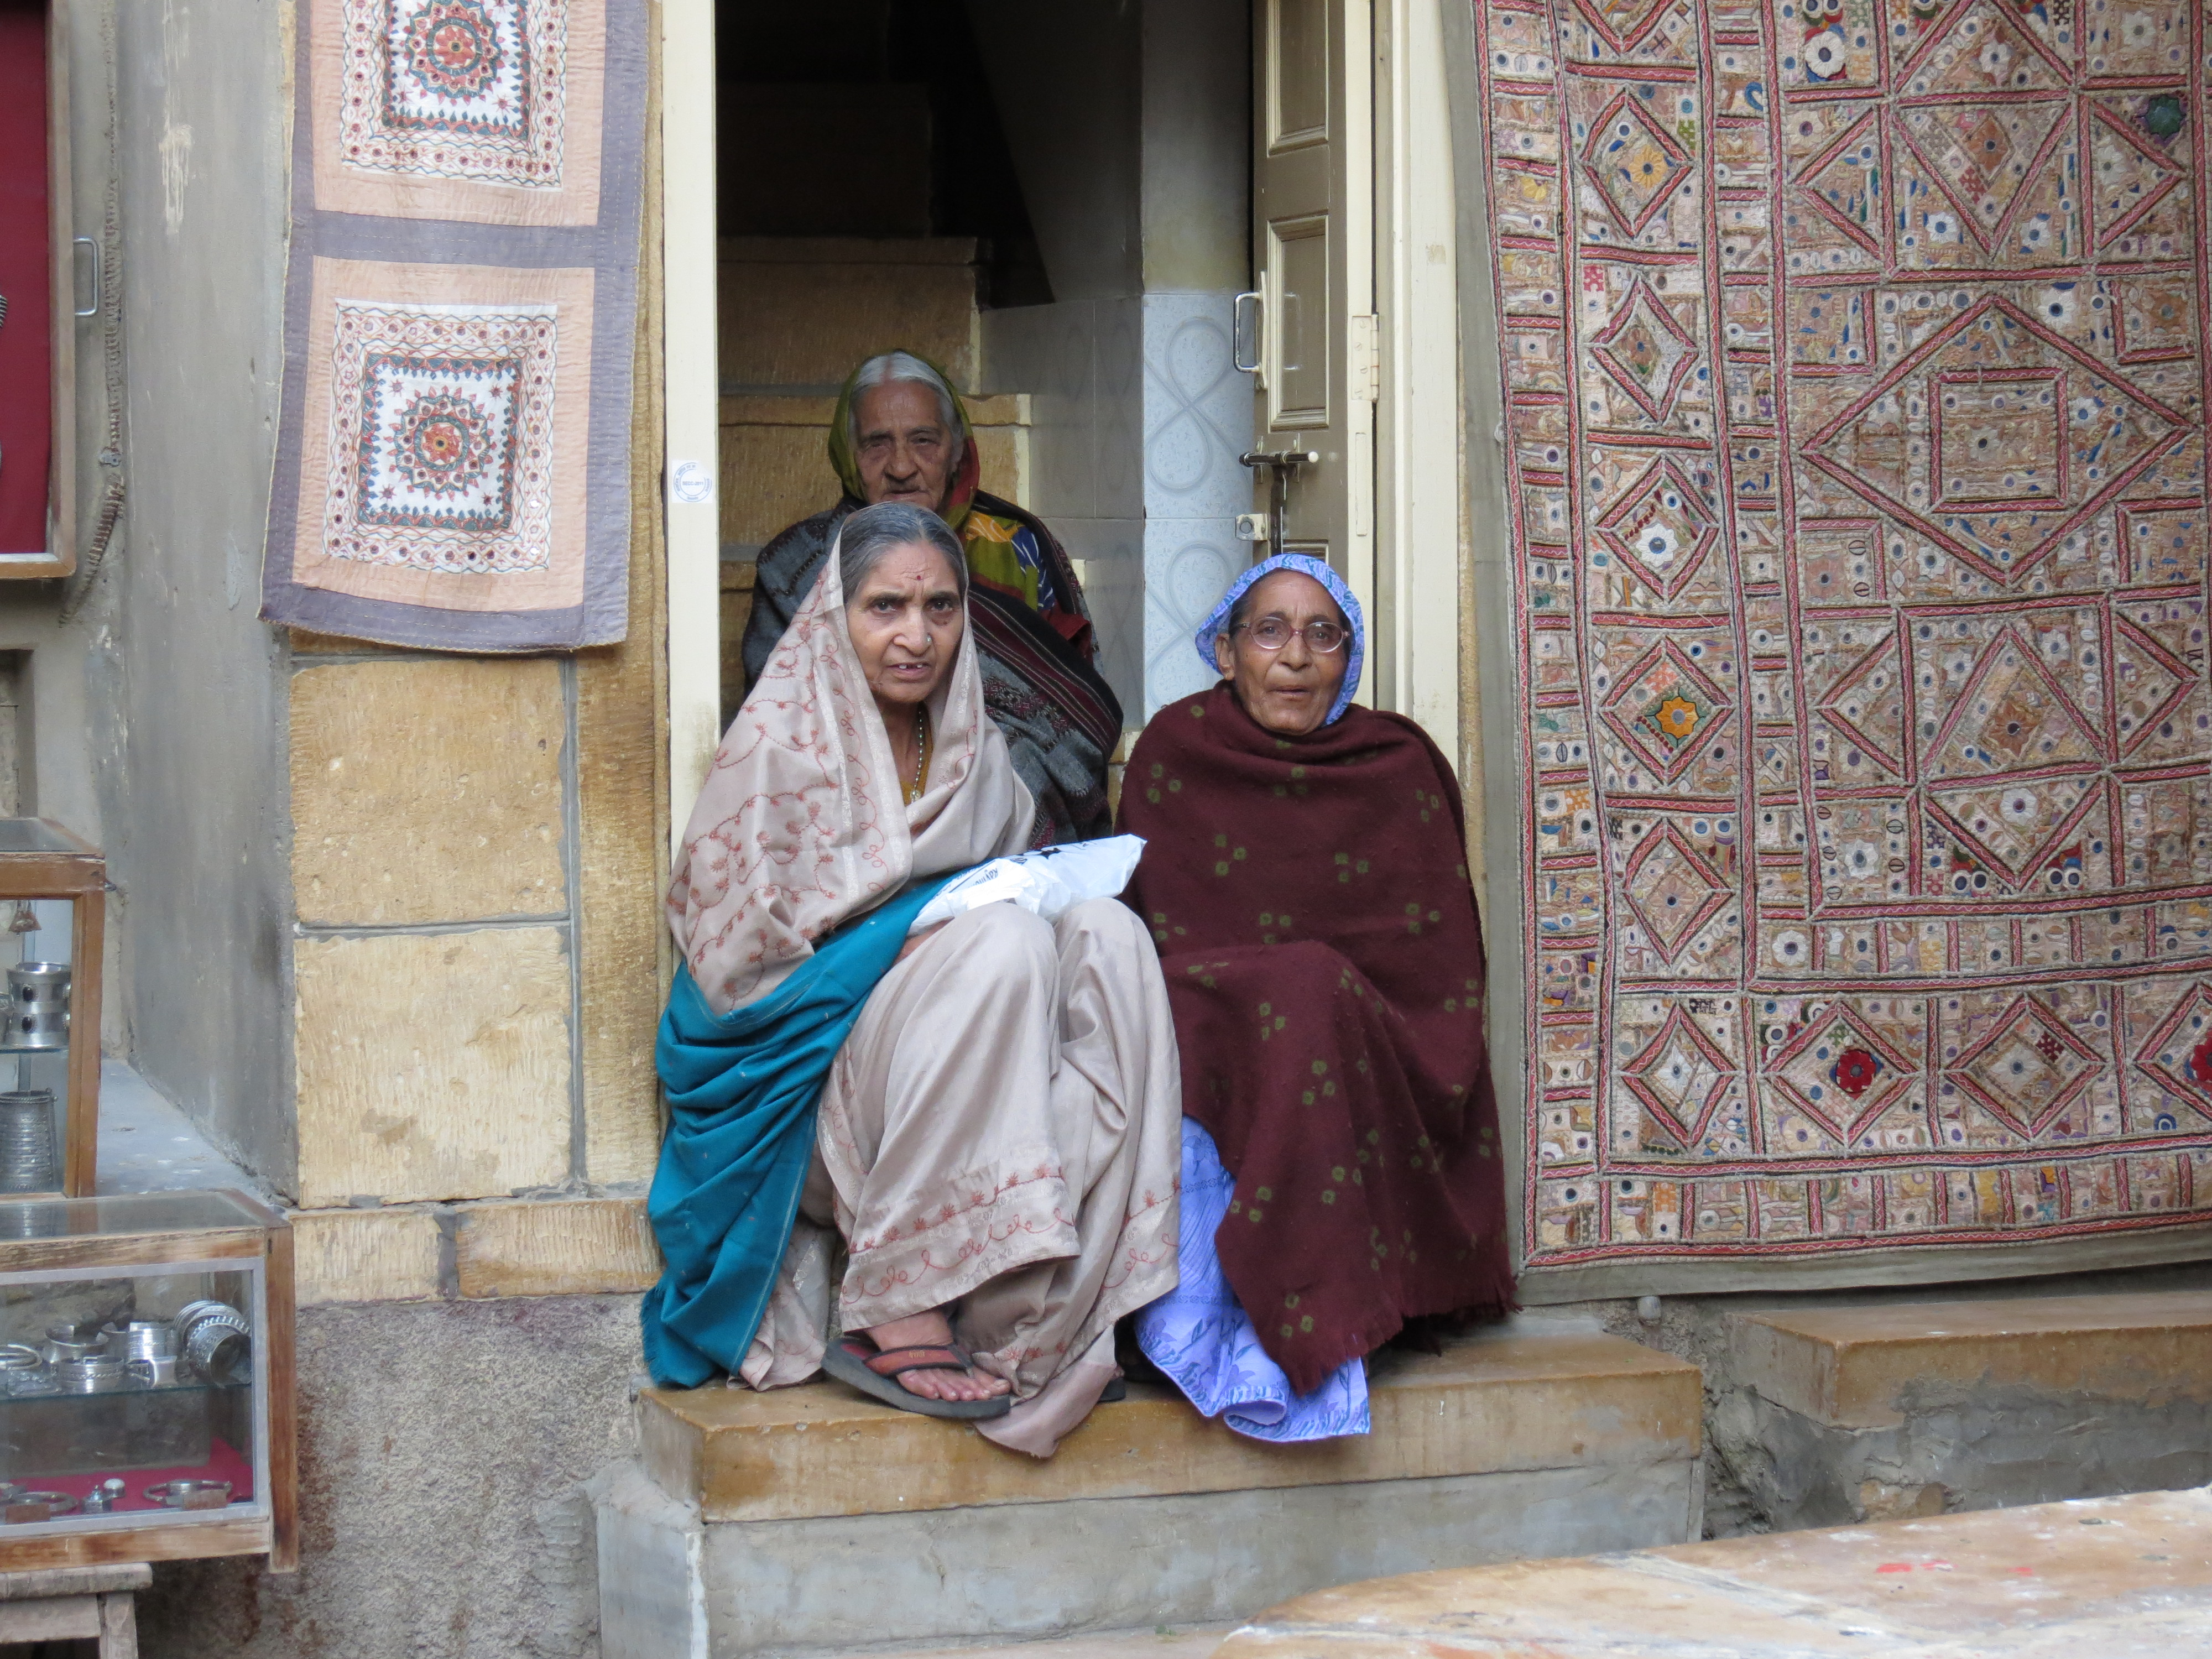 Luca Errera, Daniela Trastulli, India, Rajasthan, donne, vecchie